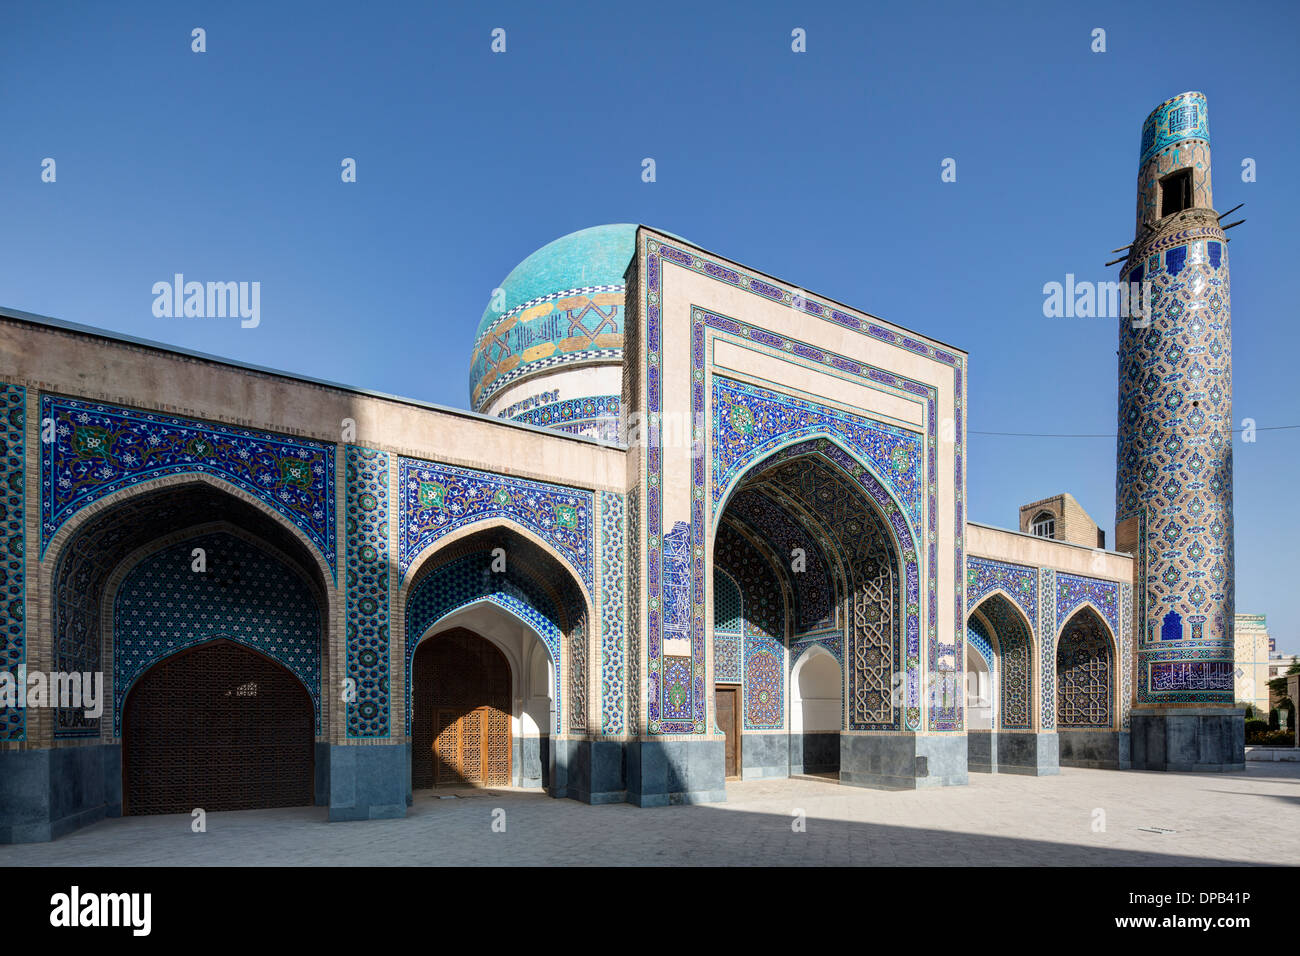 The funerary mosque of Malikshah, known as the Masjid-i Shah, Mashhad, Iran - Stock Image